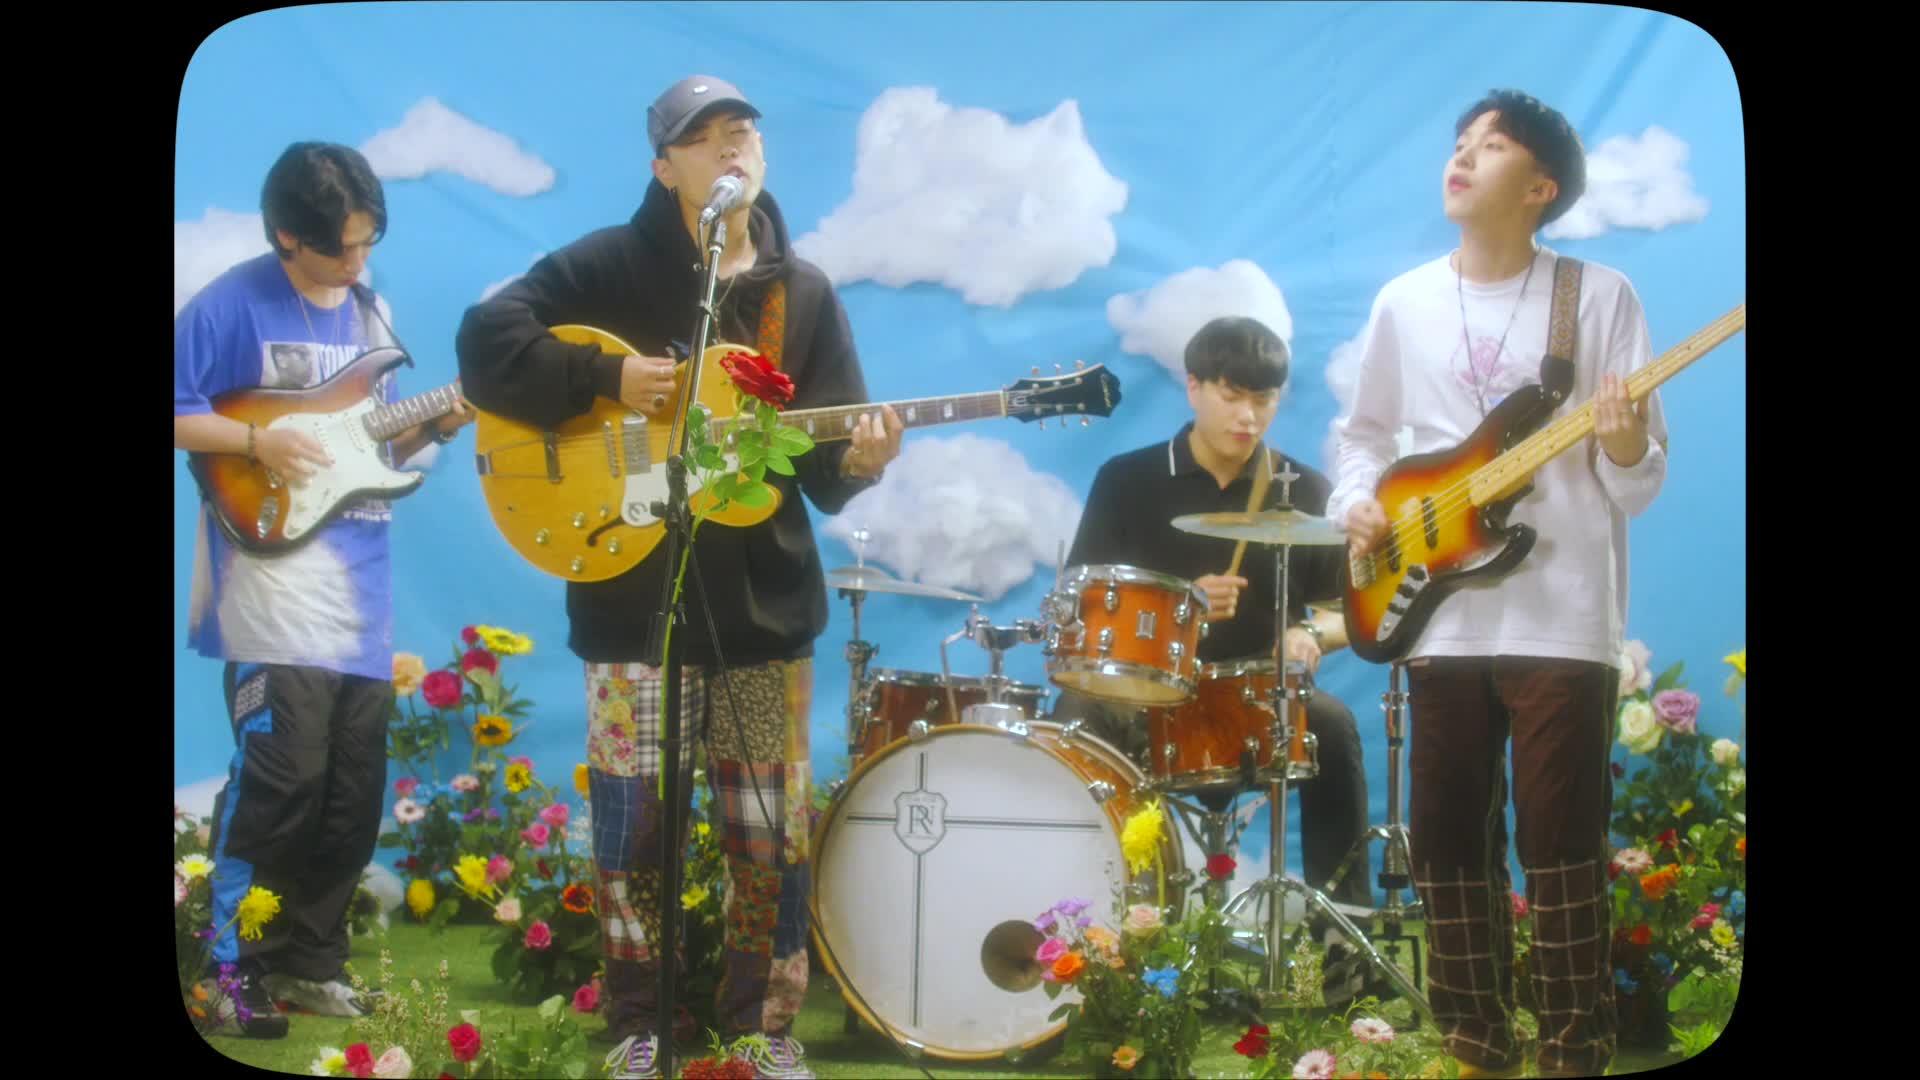 SURL (설) - 'Dry Flower' Official MV